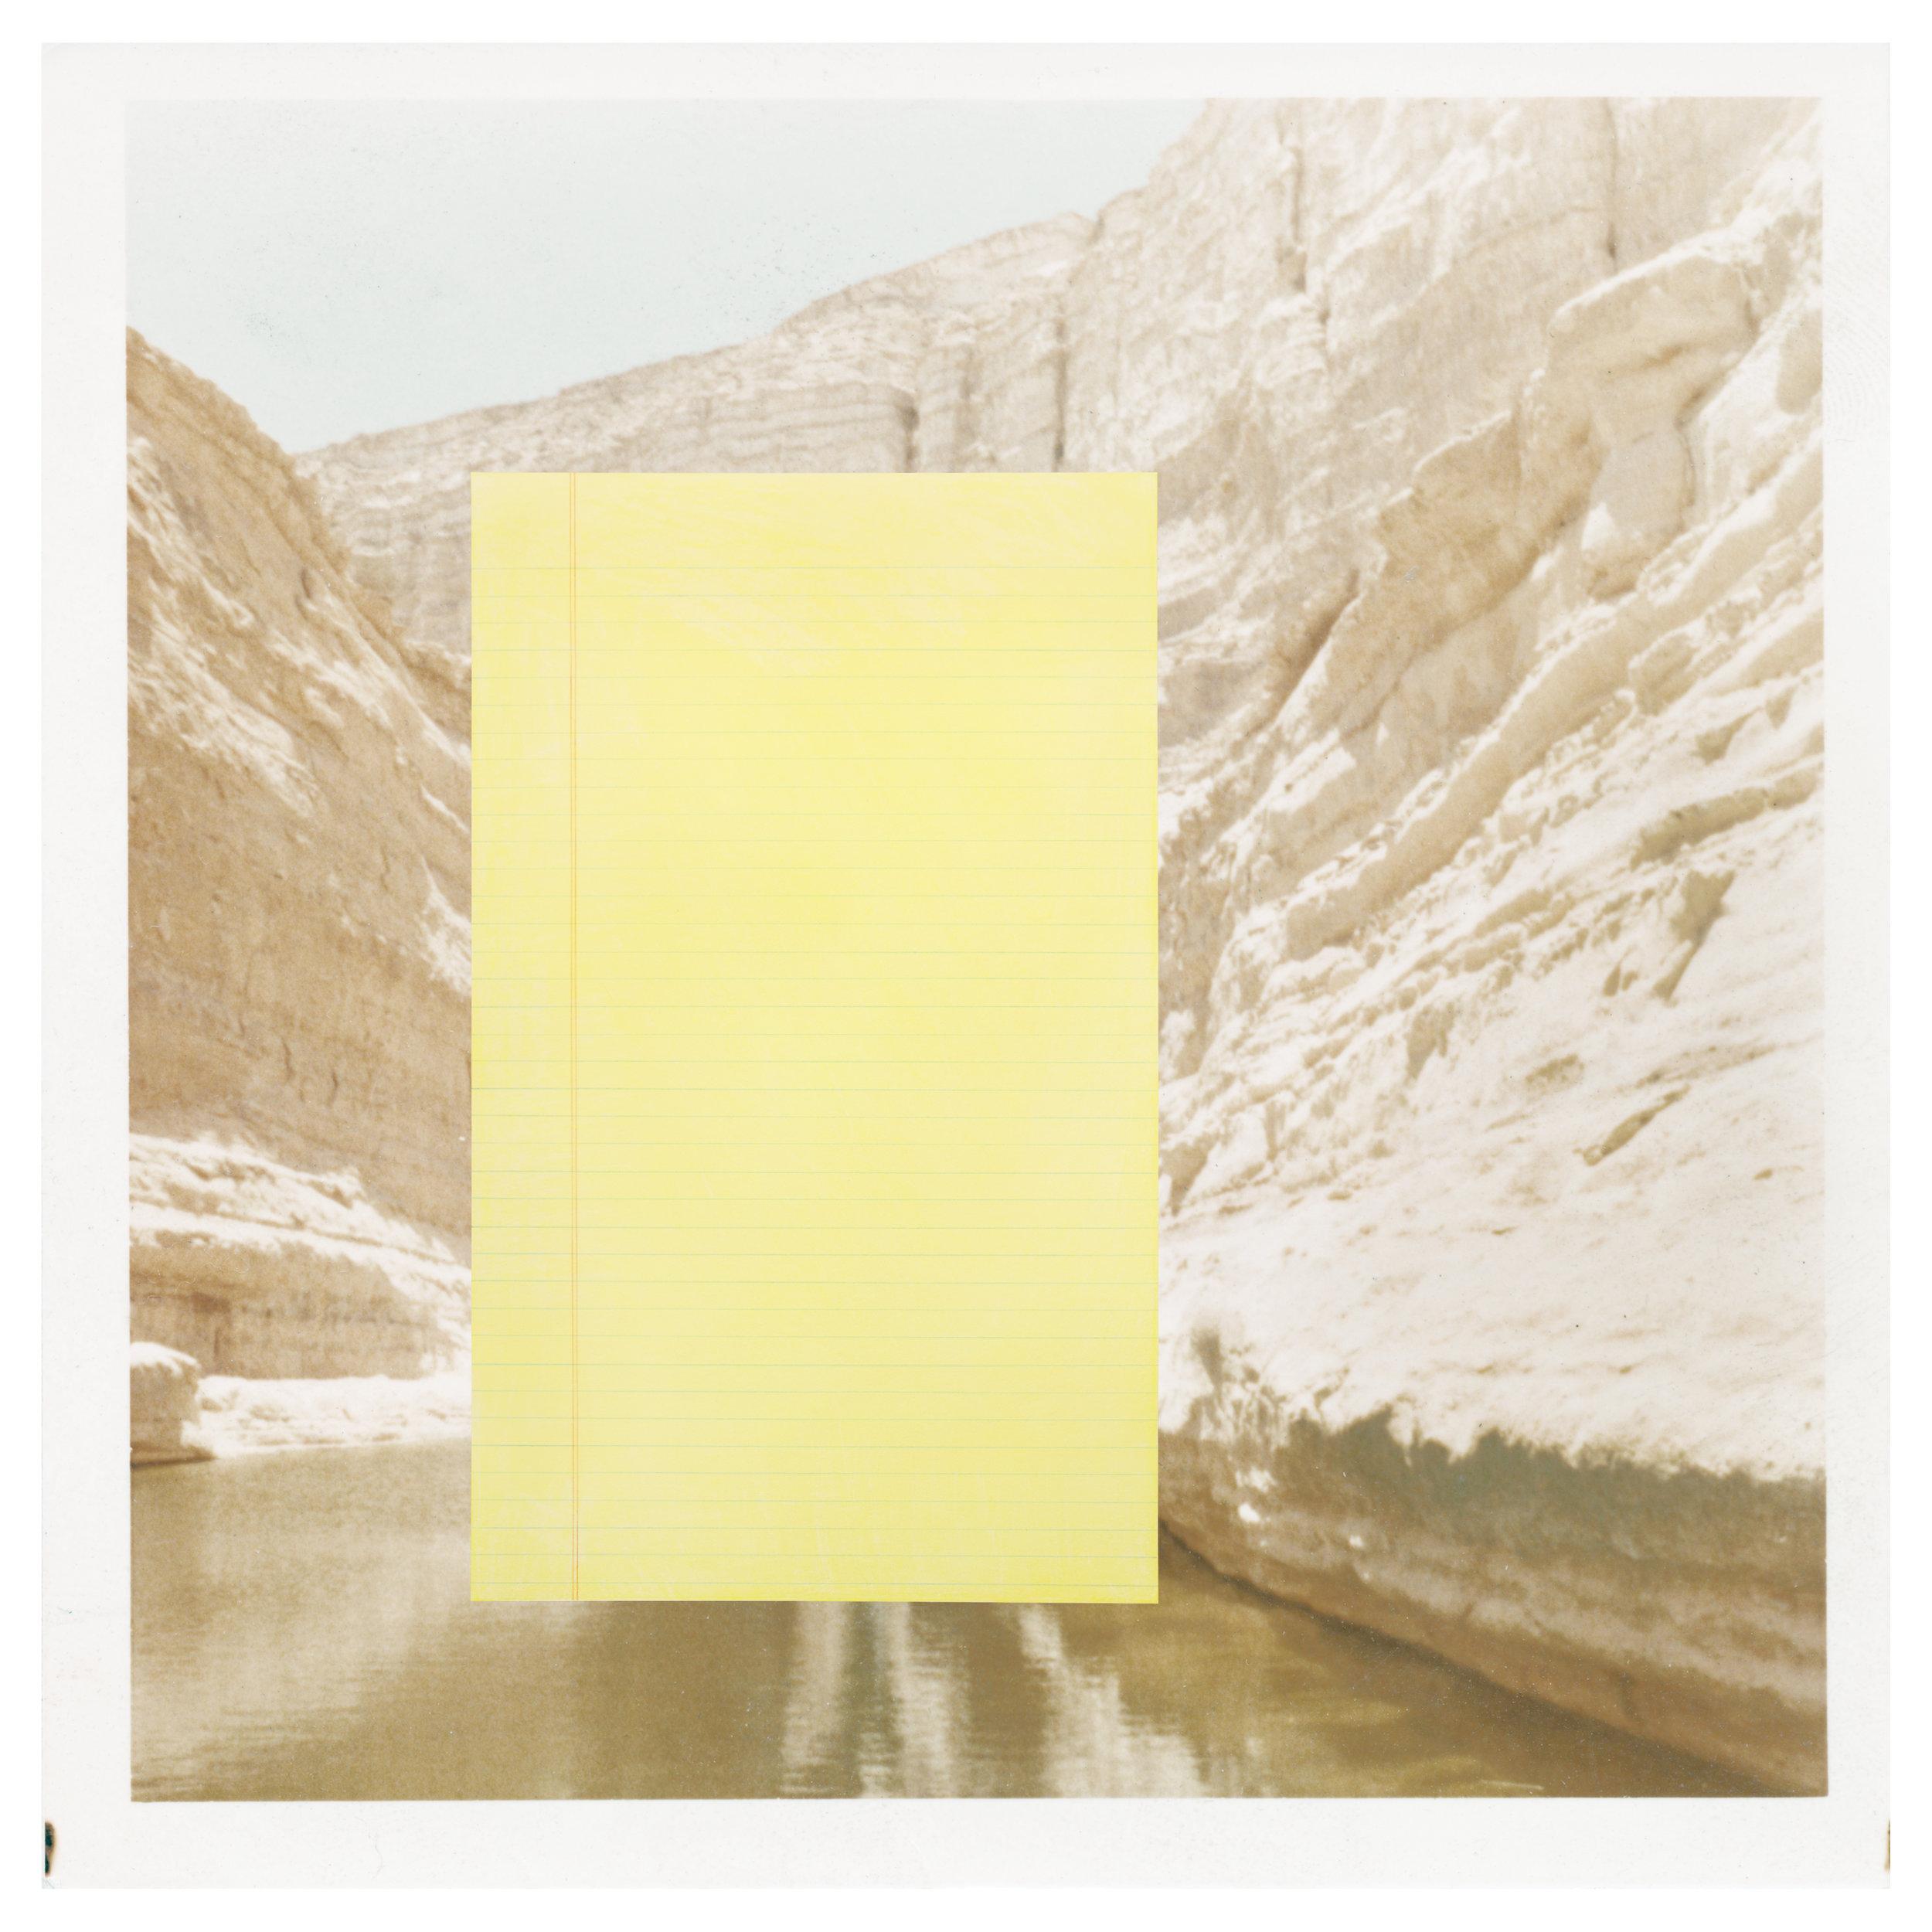 Cave  2015  Hahnamuela archival inkjet paper, pastel, pencil  24 X 24 Inches